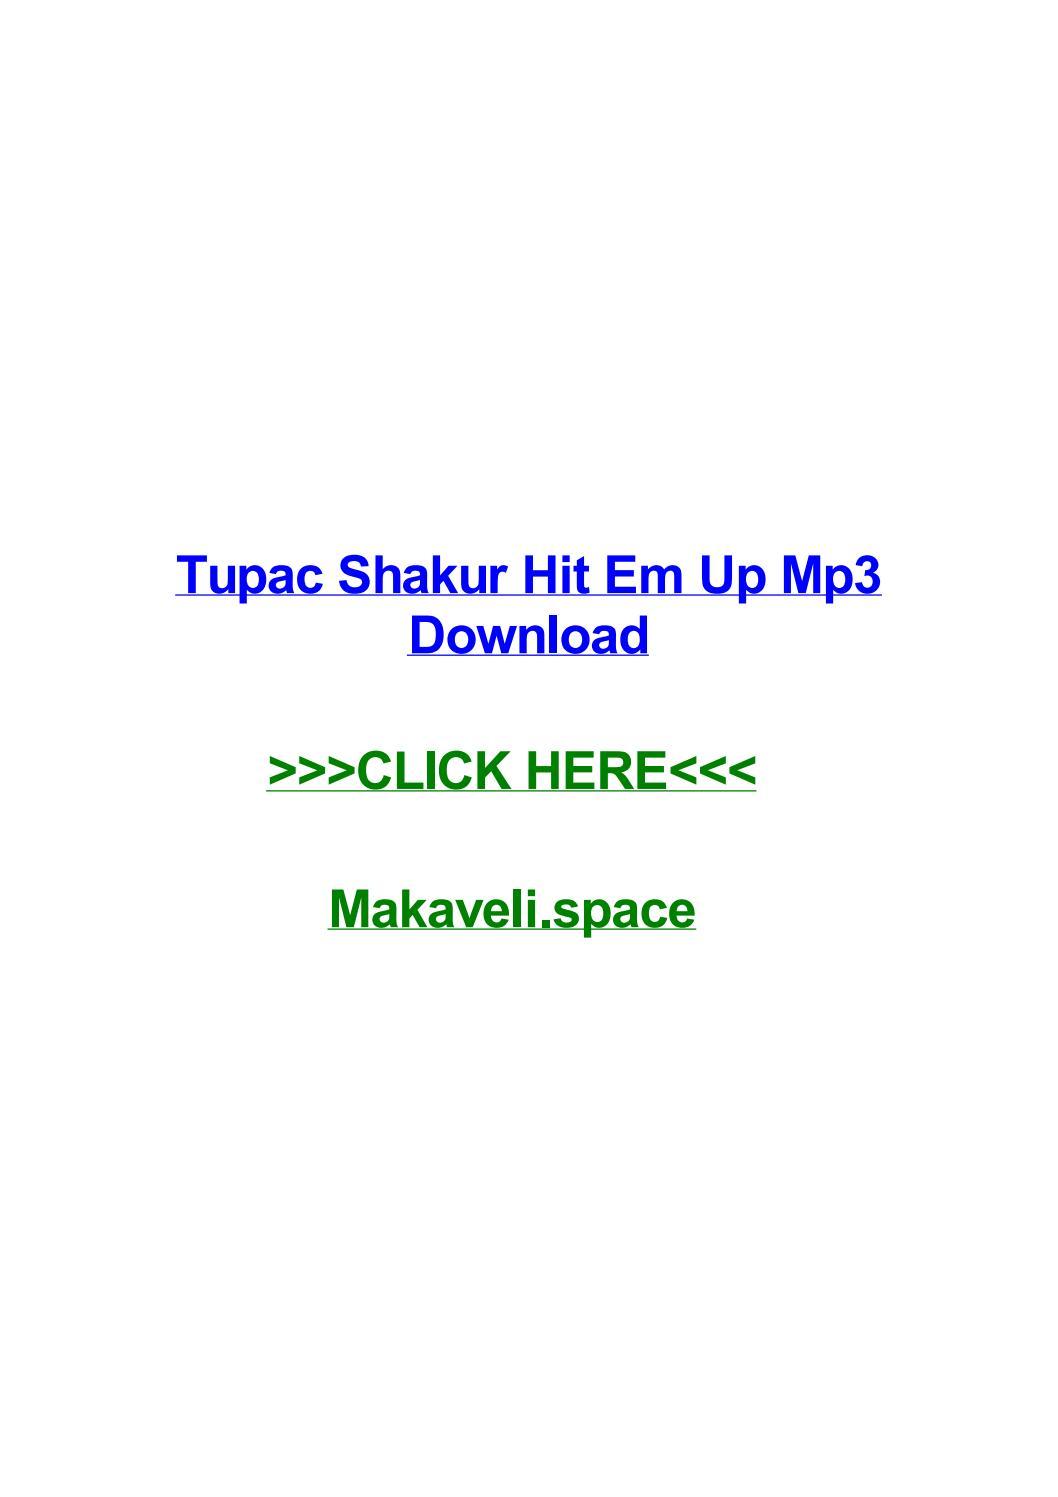 Tupac shakur hit em up mp3 download by corylnur - issuu